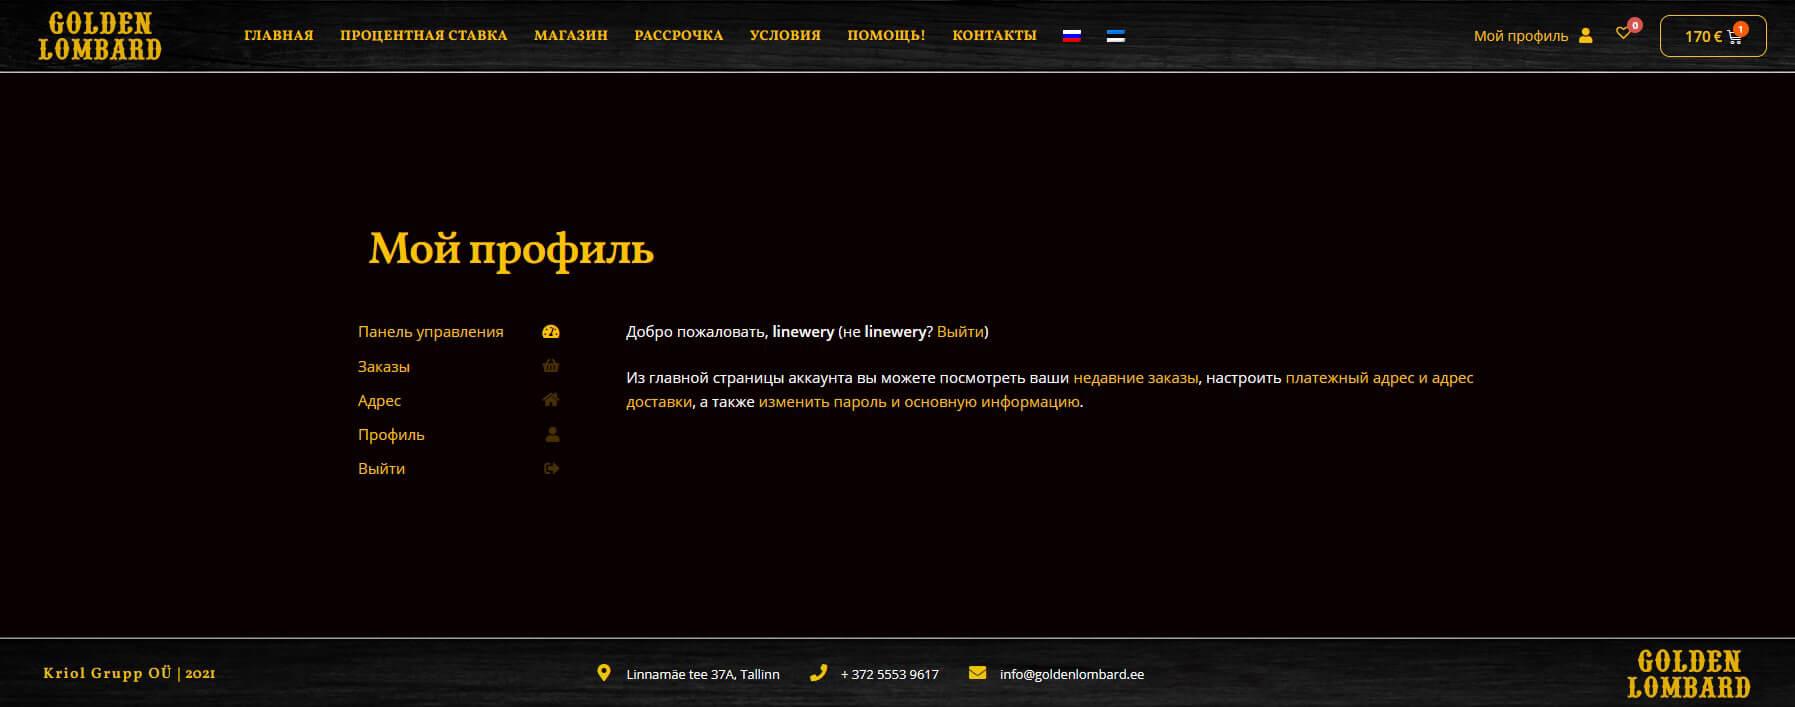 Golden Lombard - страница личного профиля